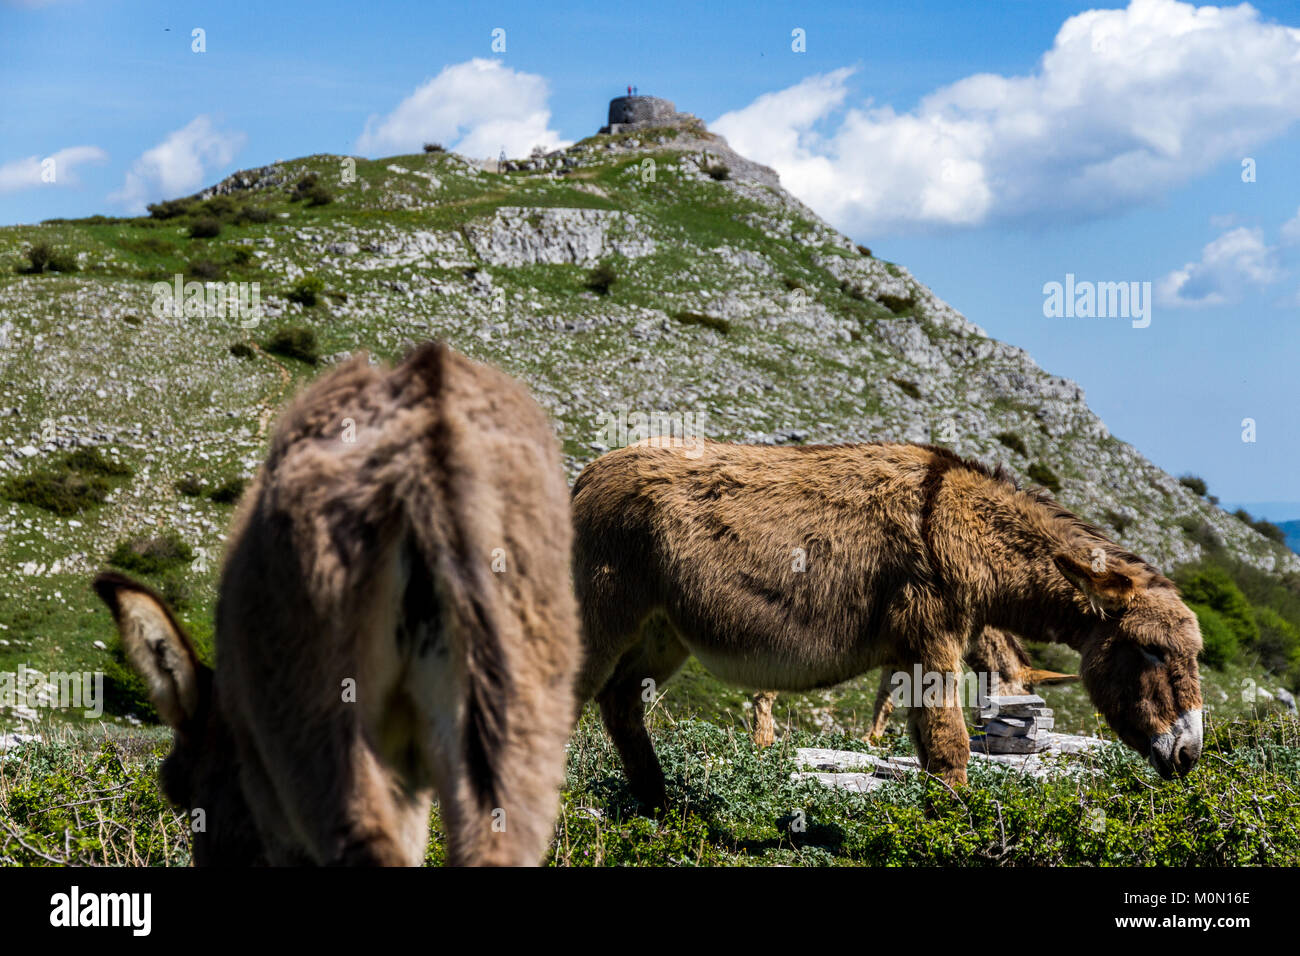 Donkey and goat stock photos donkey and goat stock for Asino amiatino